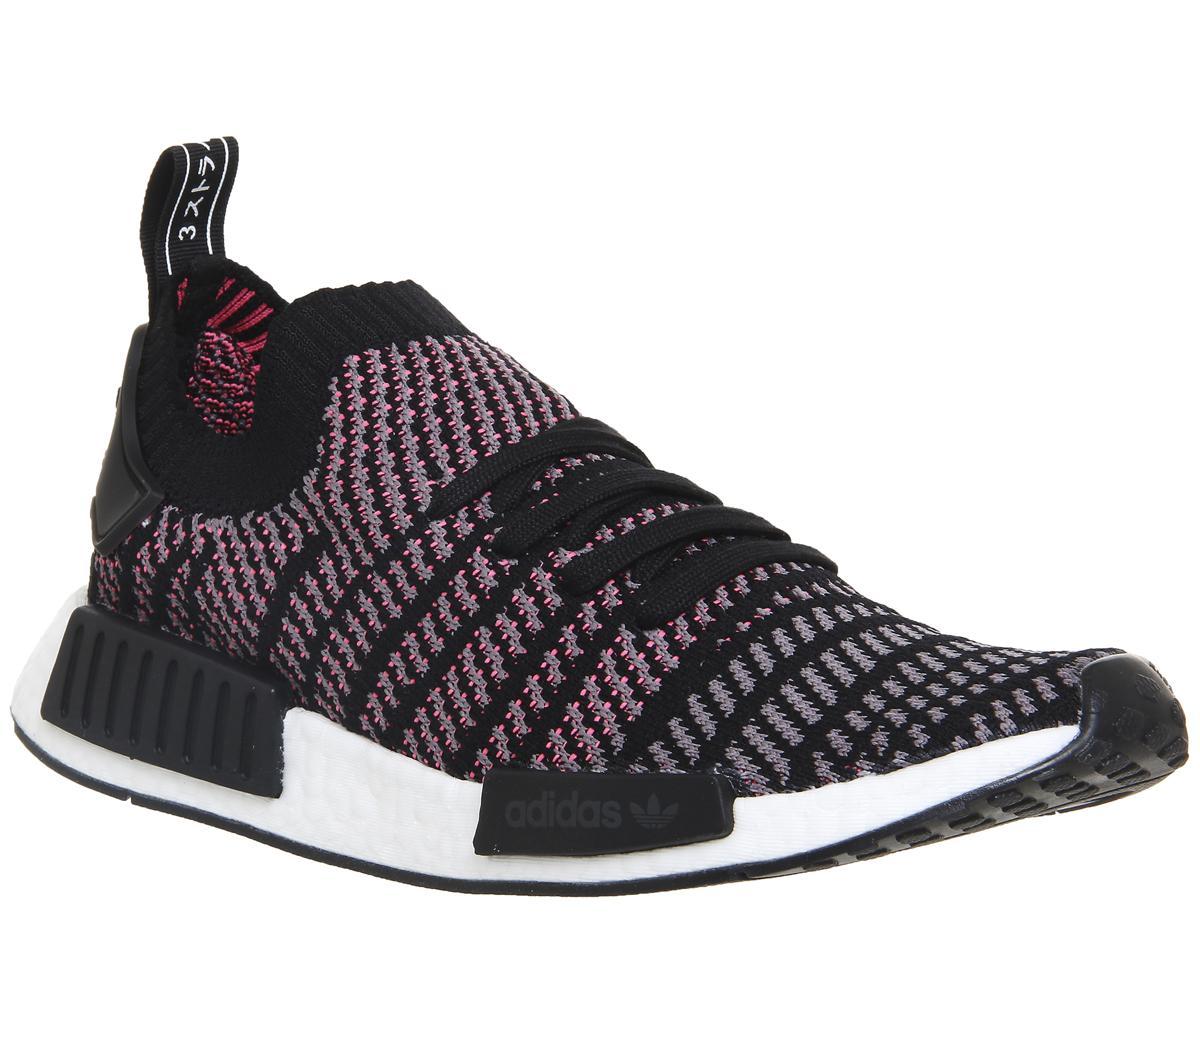 Mens Adidas Nmd R1 Prime Knit Clear Black Grey Solar Pink